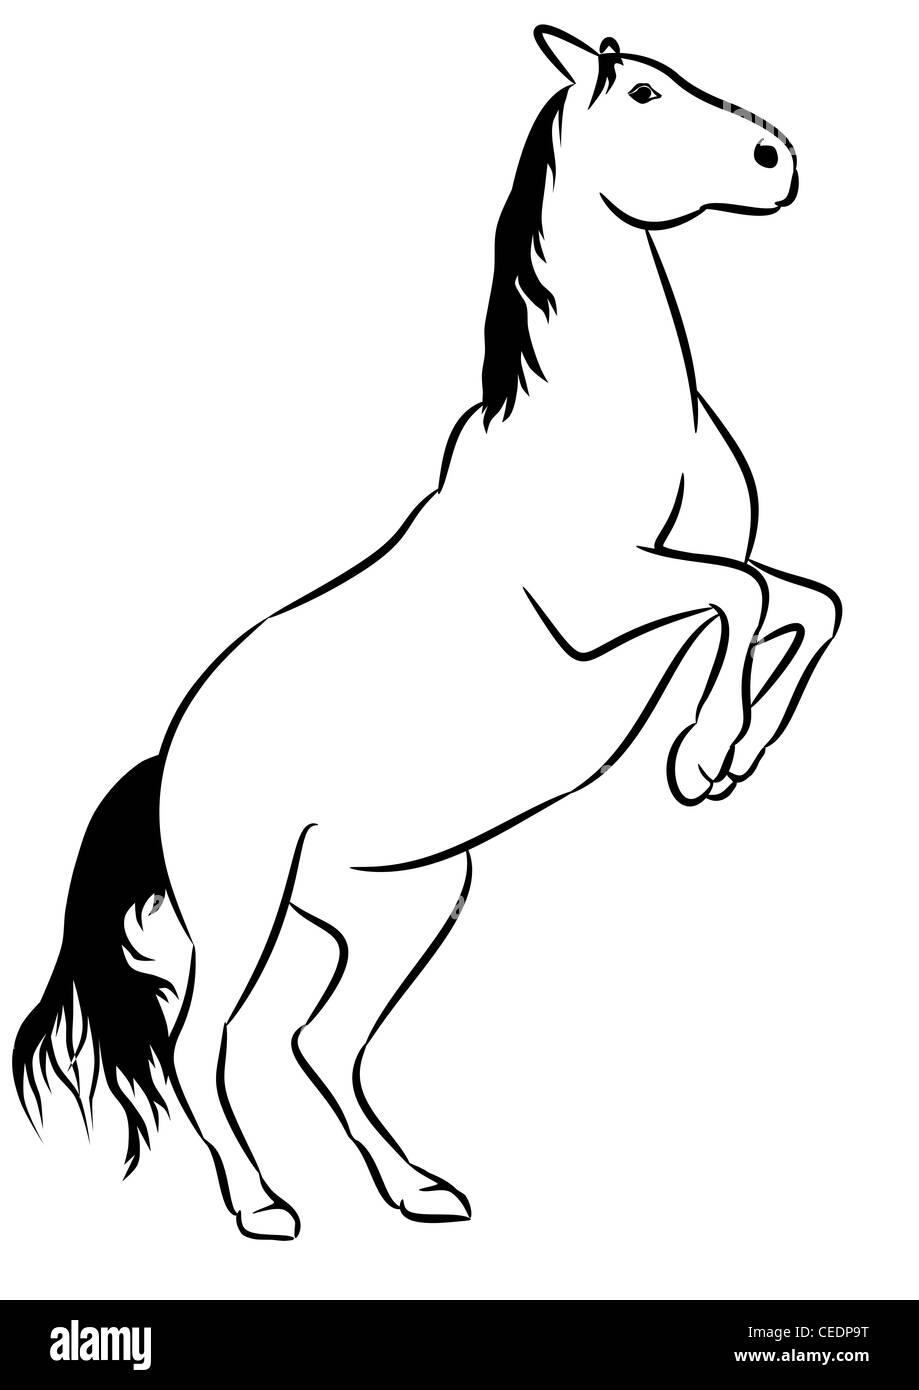 Wild Horse Line Drawing Stock Photo Alamy